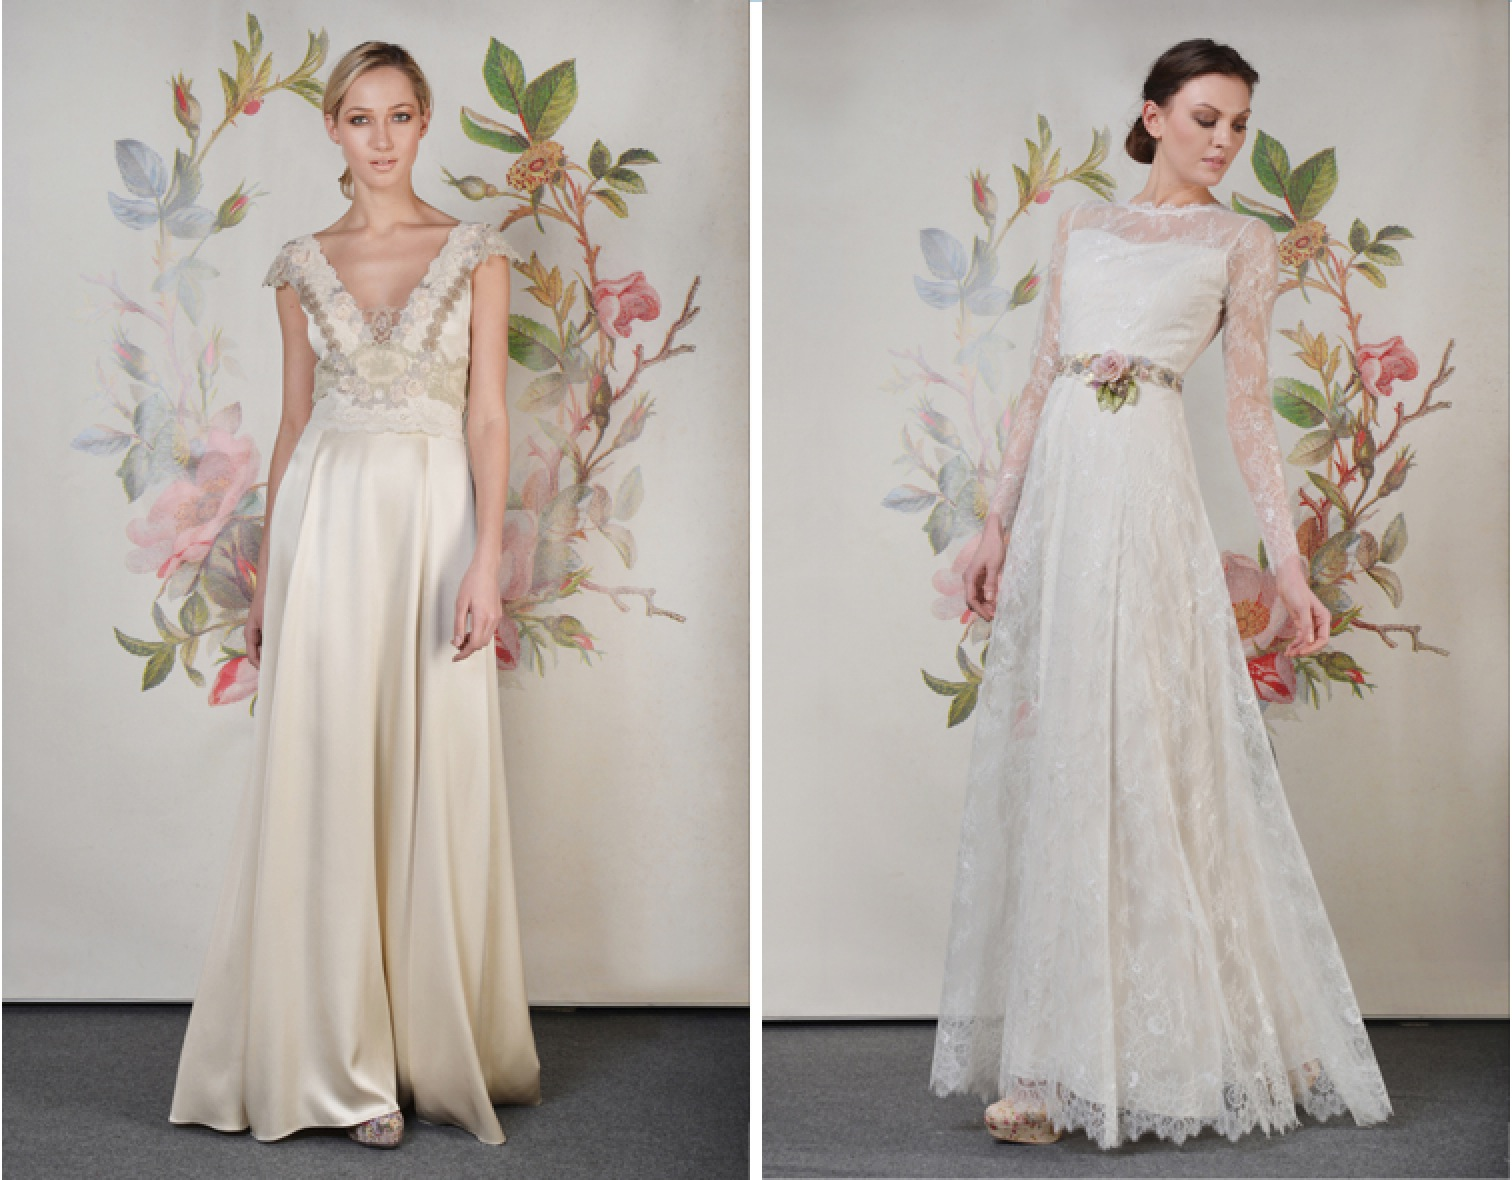 Wedding Dresses, Romantic Wedding Dresses, Vintage Wedding Dresses, Fashion, Claire pettibone